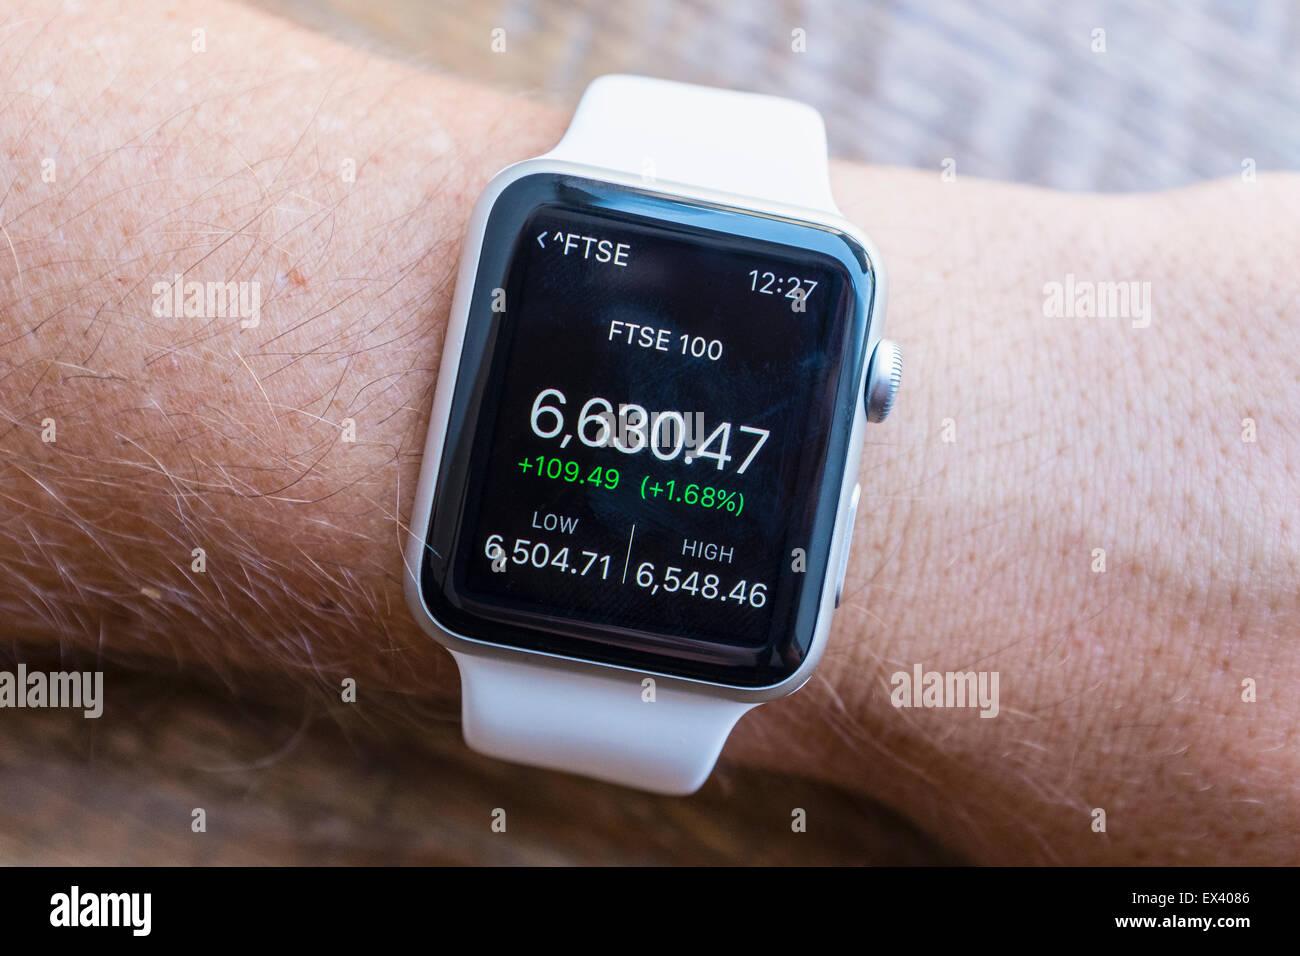 apple watch smartwatch stock market stock photos apple watch